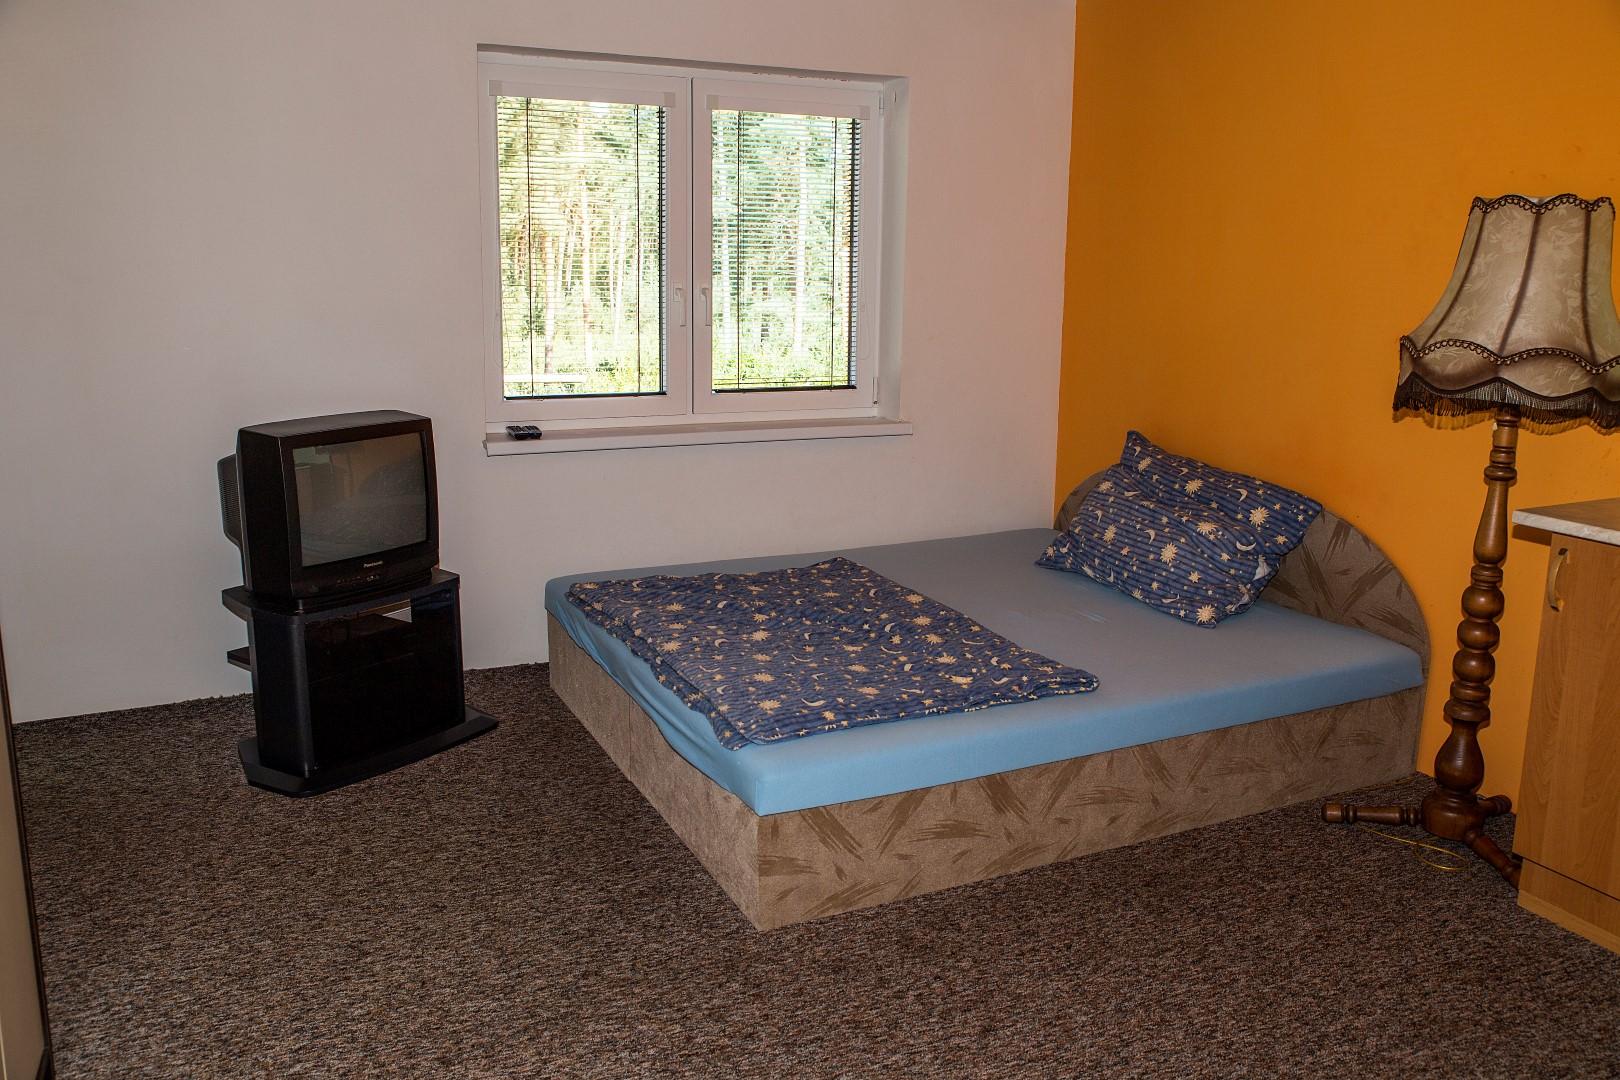 Apartmán 2 lůžka (patro) - postel + TV